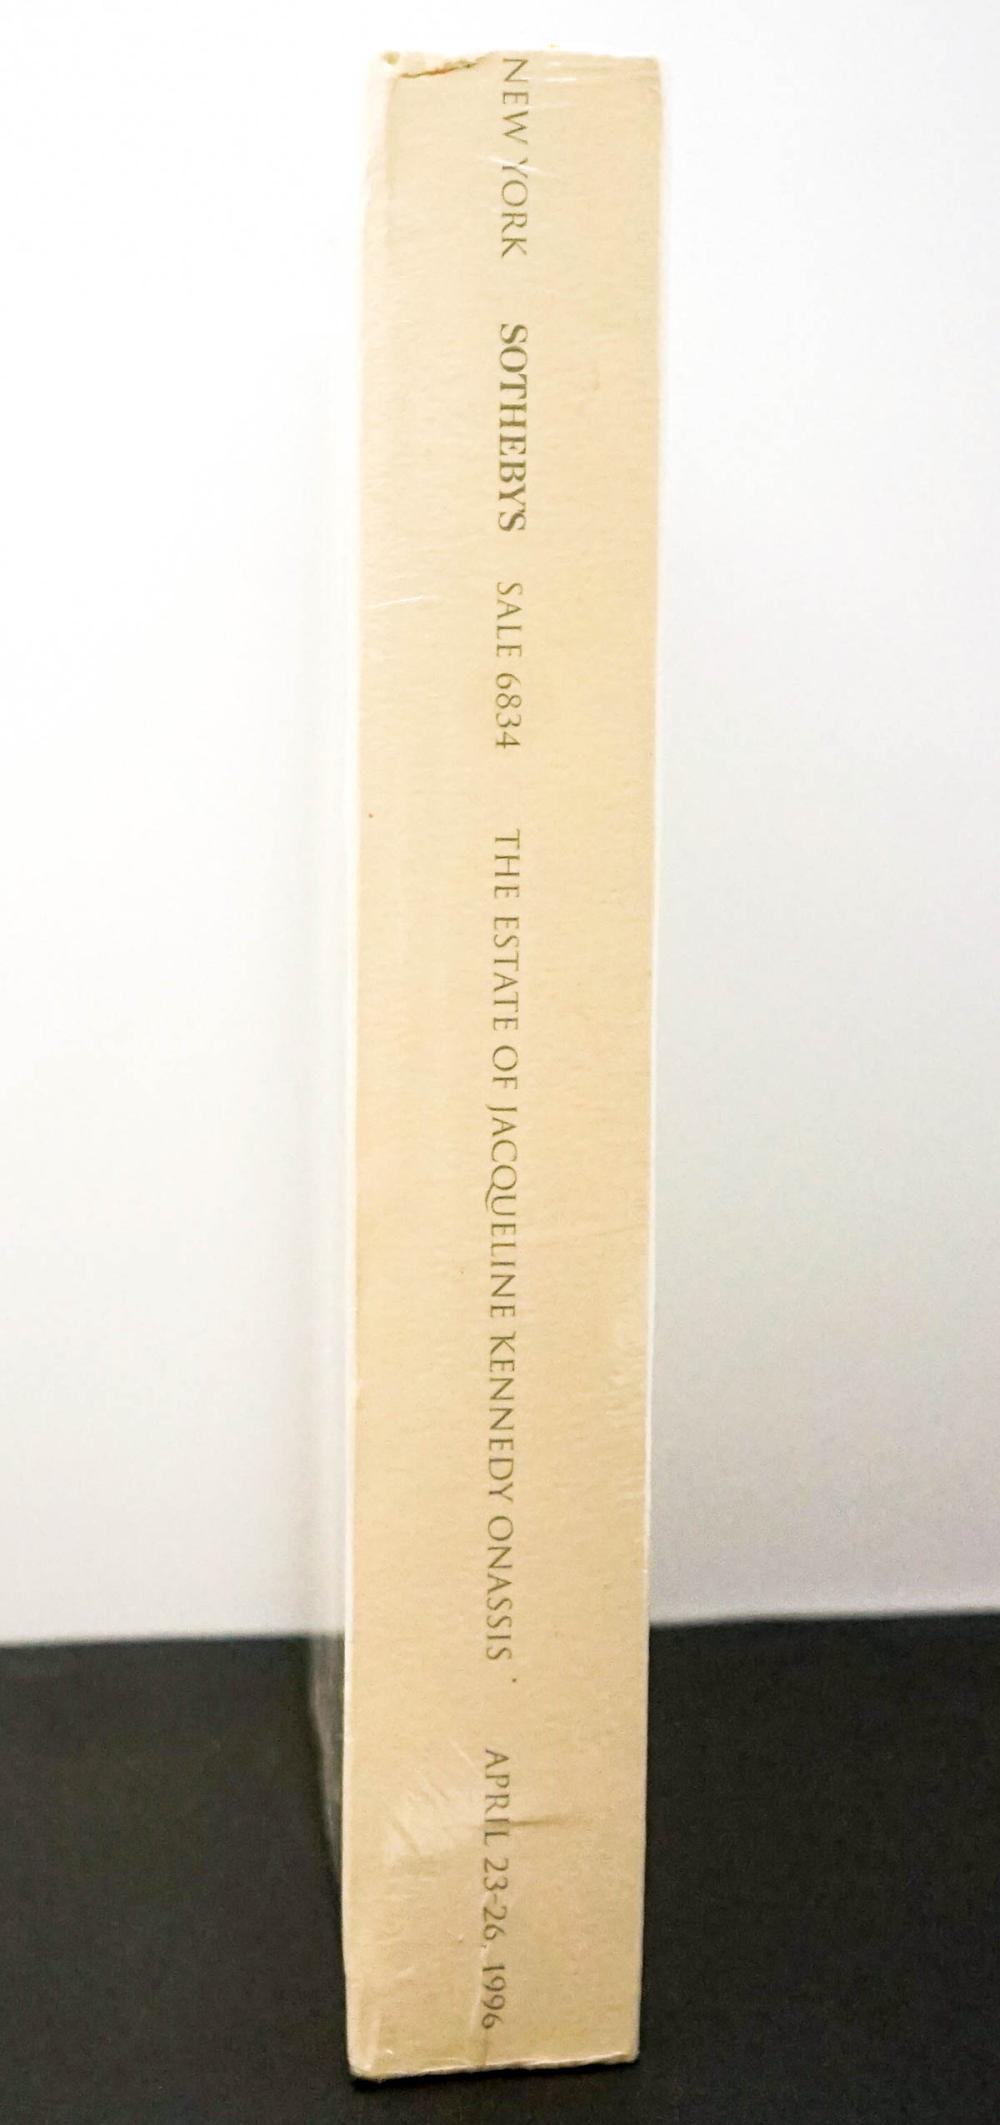 Lot 270: Jacqueline Kennedy Onassis Sotheby's Catalog